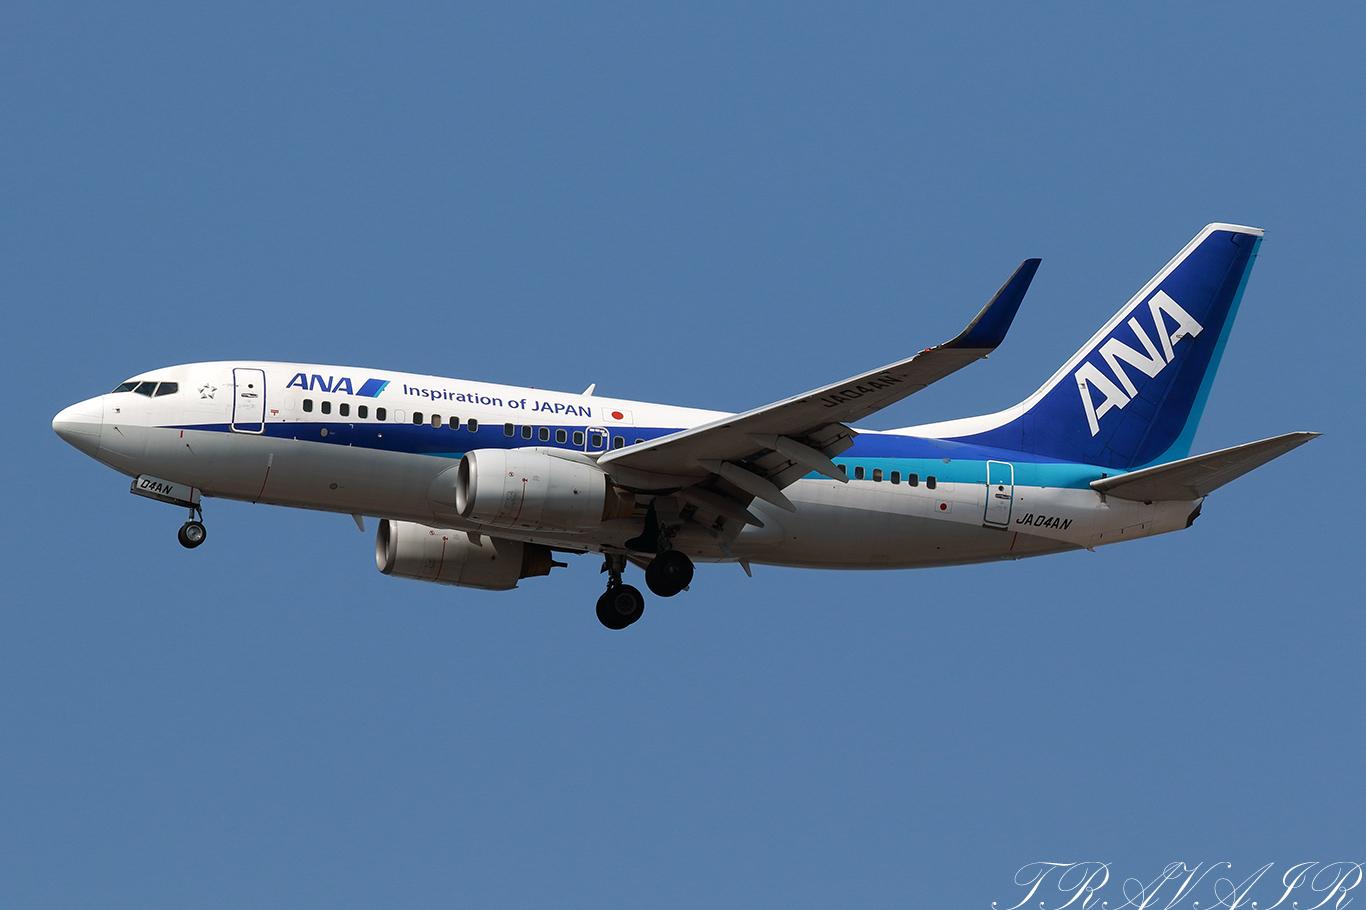 NH/ANA/全日空 NH296 B737-700 JA04AN